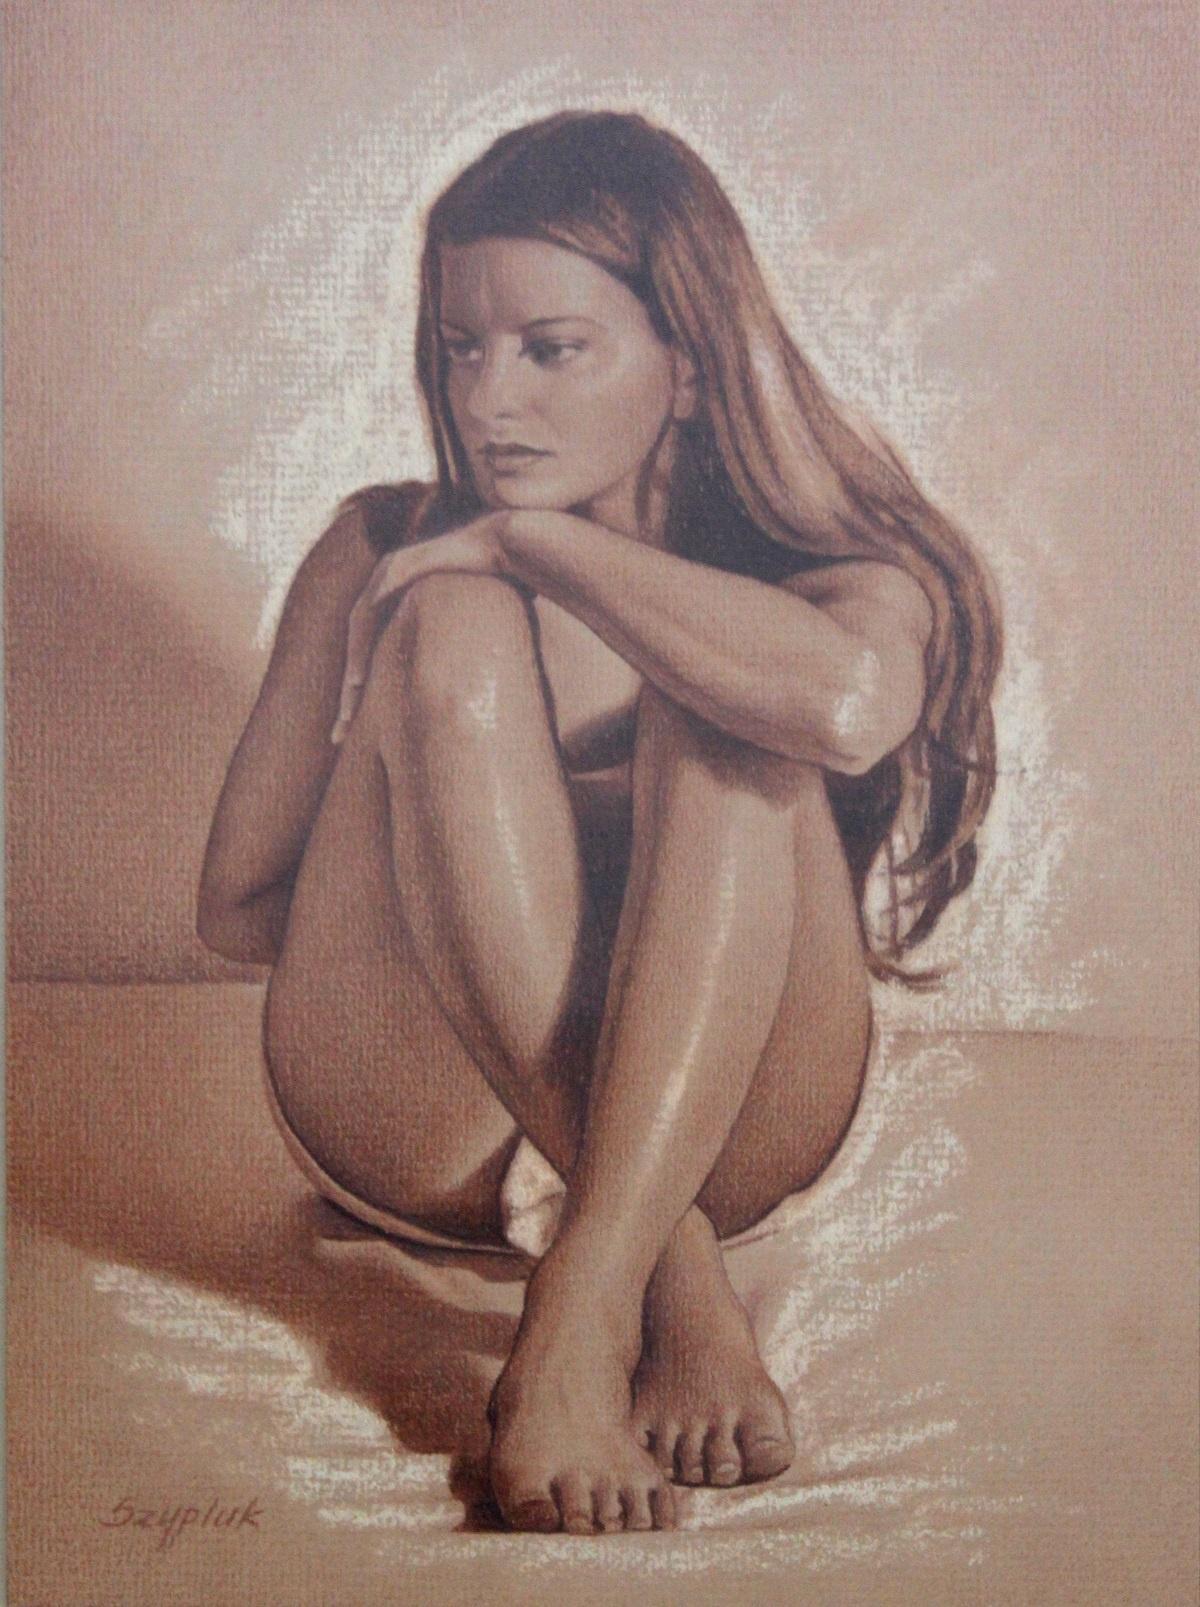 A girl II - XXI century, Contemporary Realistic Figurative Mixed Media Drawing